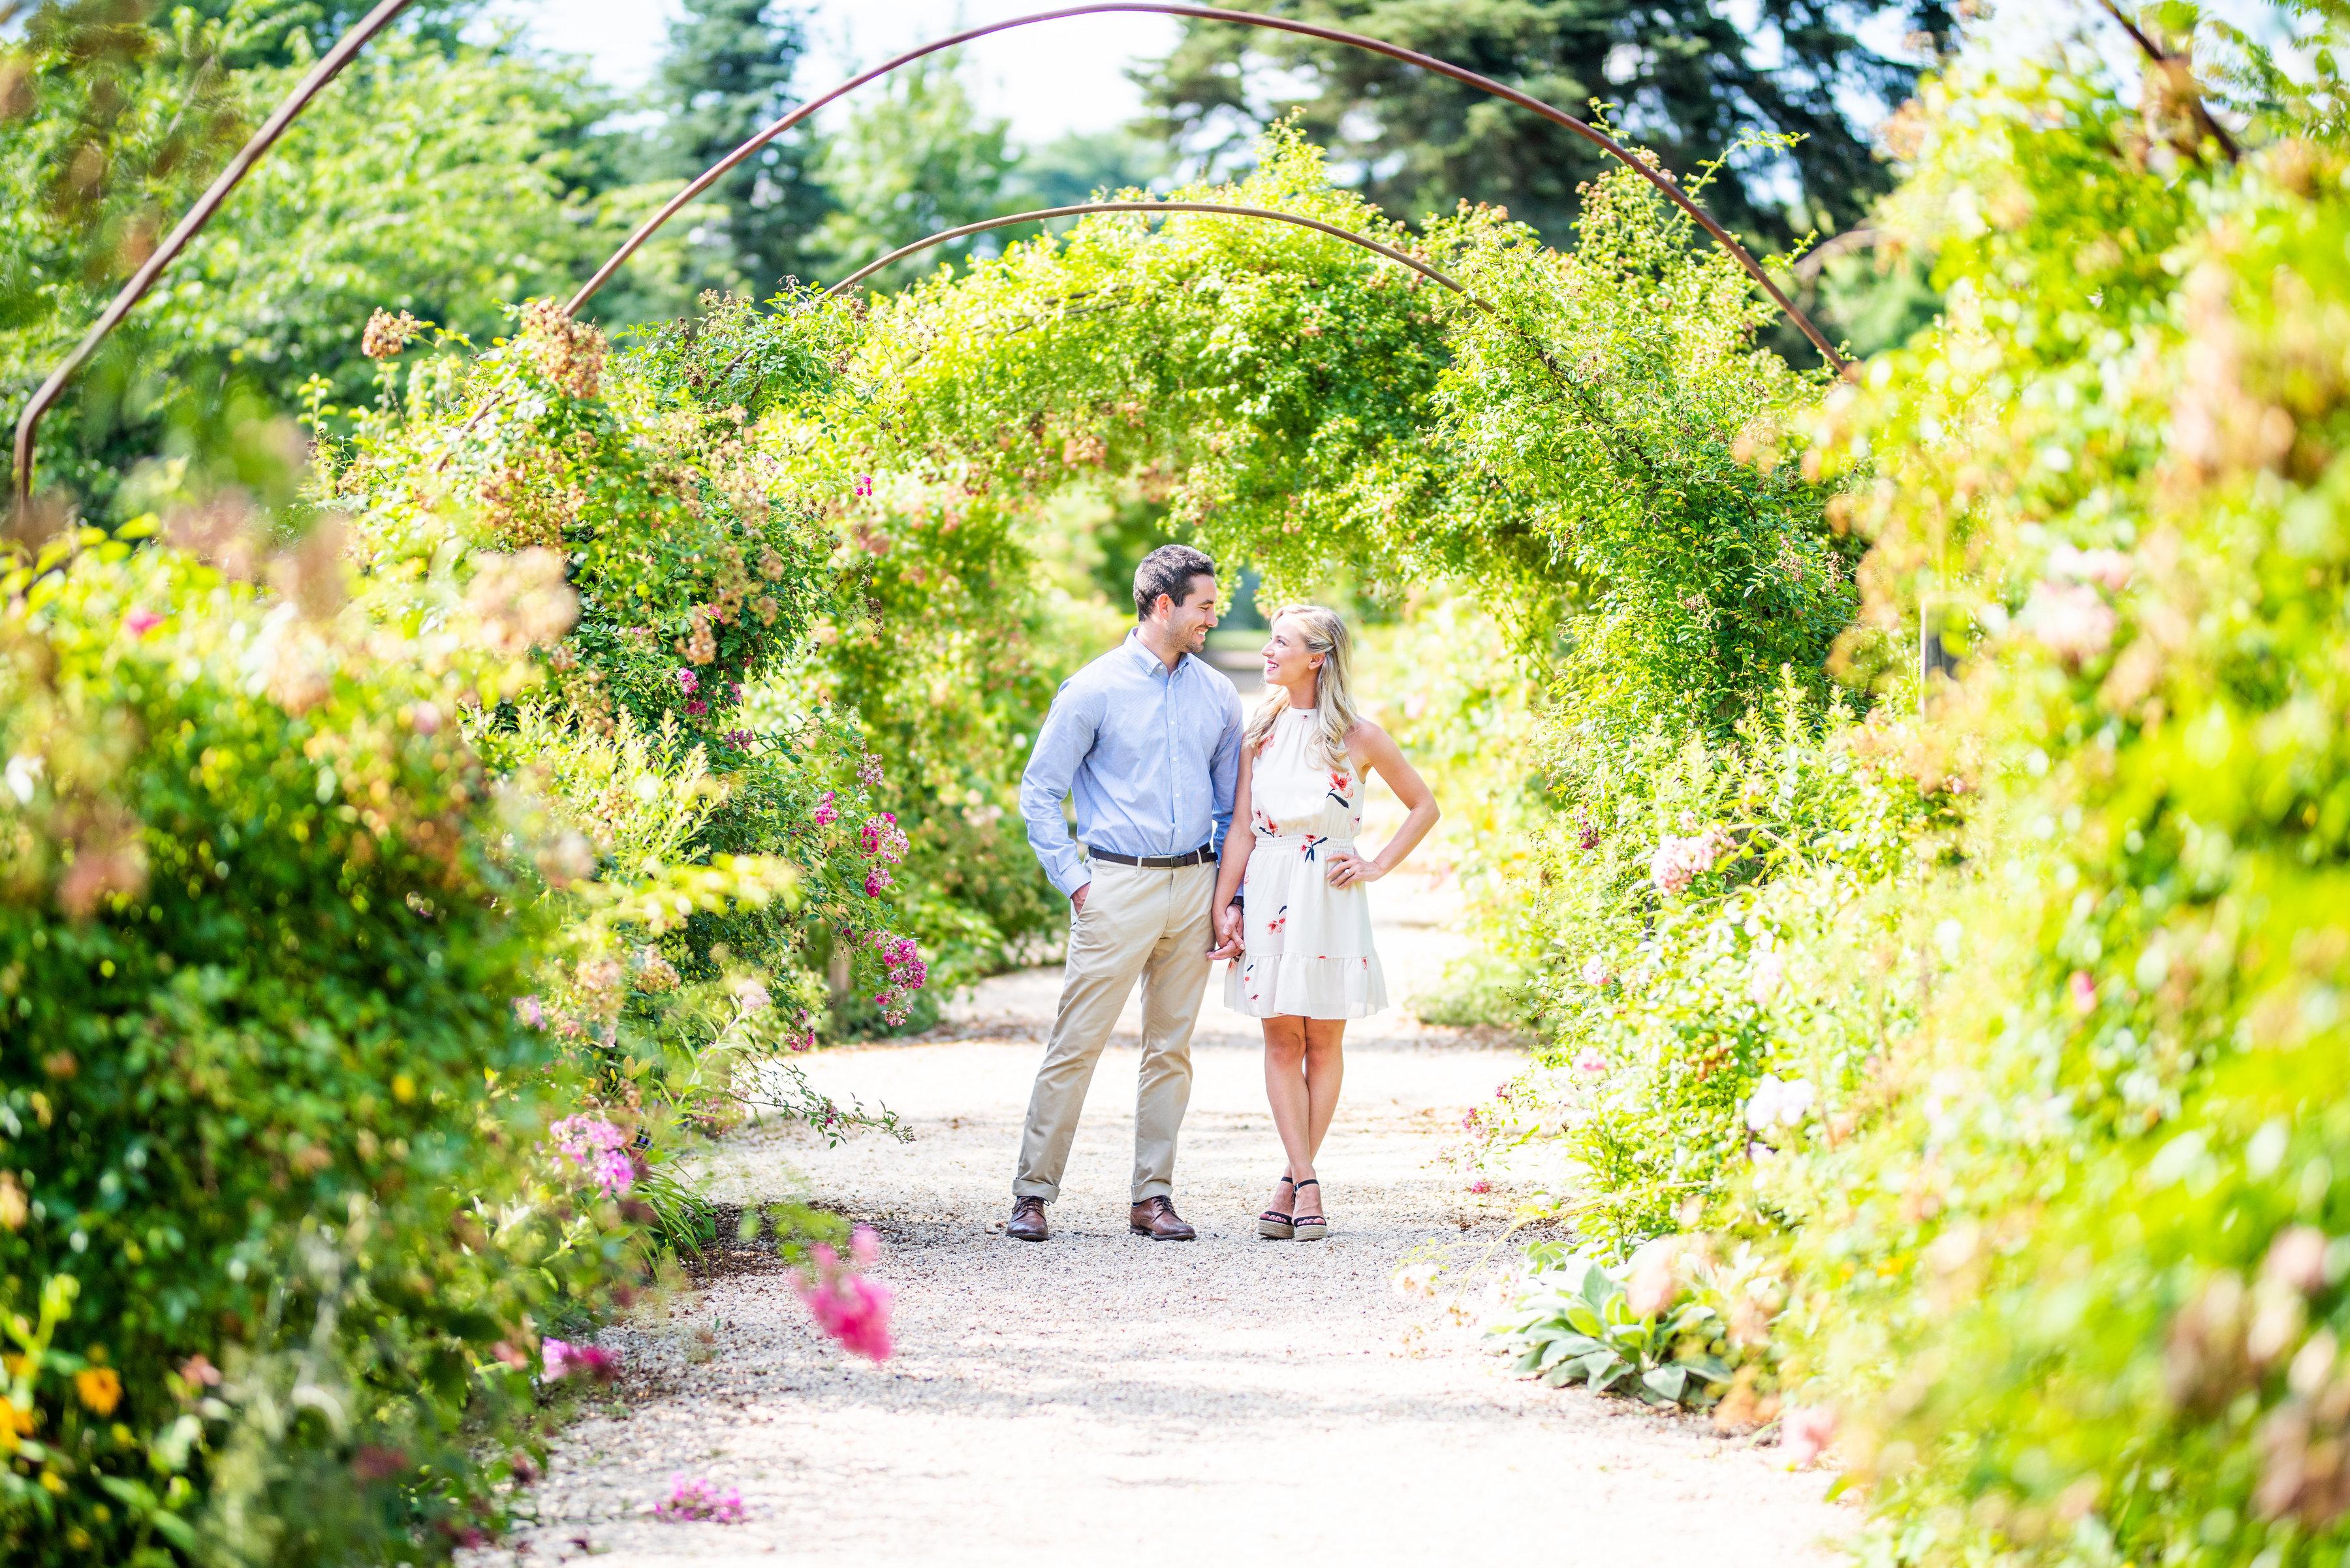 Planting Fields Arboretum Engagement Shoot | Oyster Bay Engagement Shoot | Long Island Wedding Photographer15